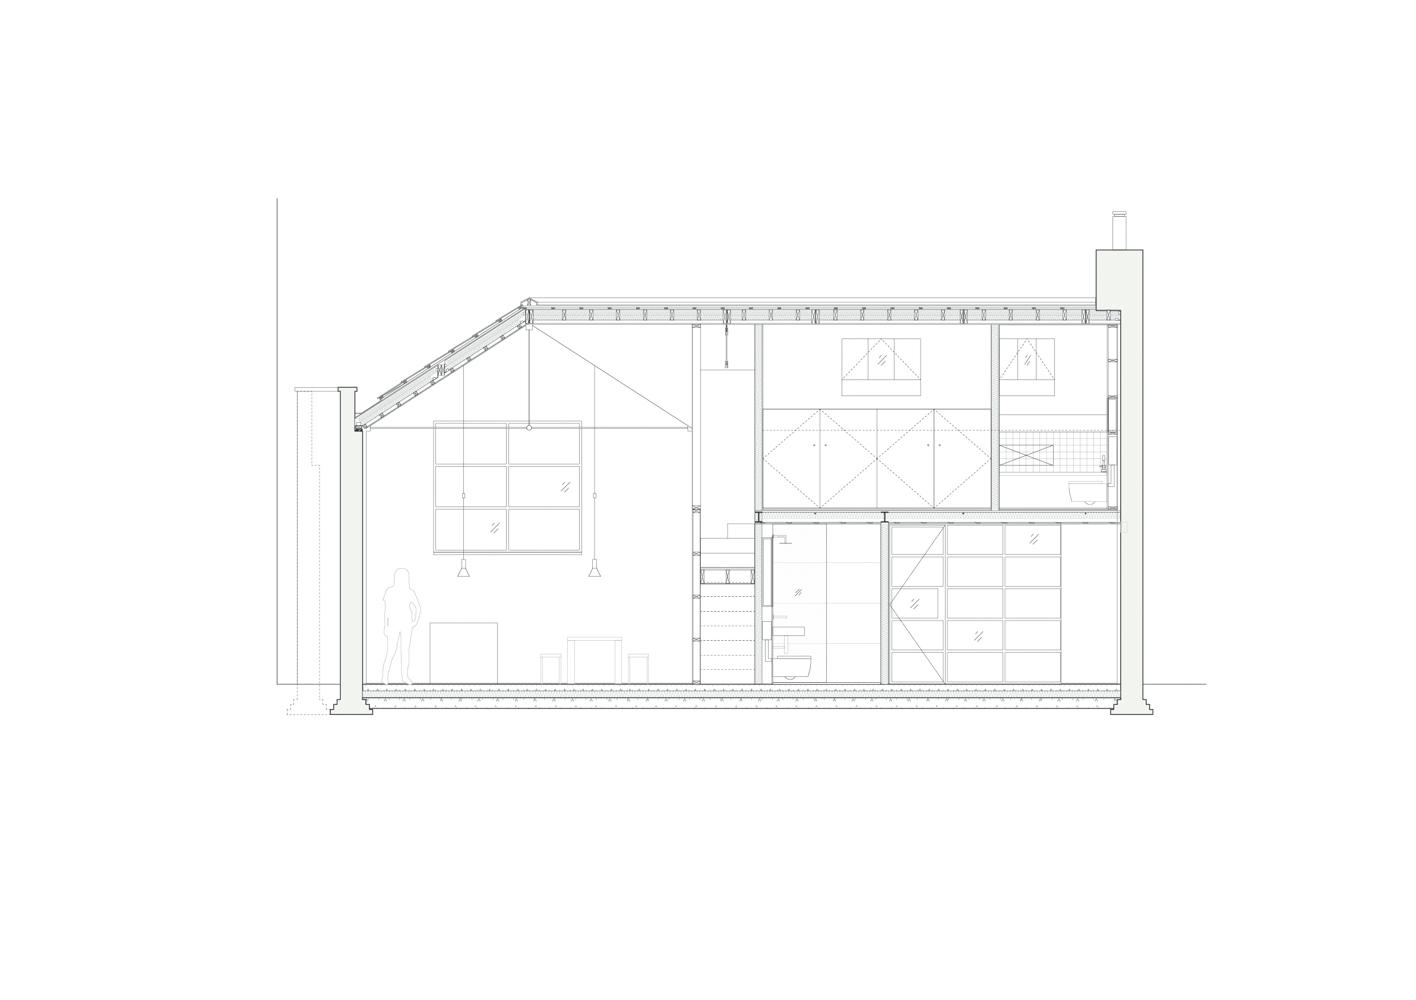 defoe-road-paper-house-project-the-design-emotive-19.jpg